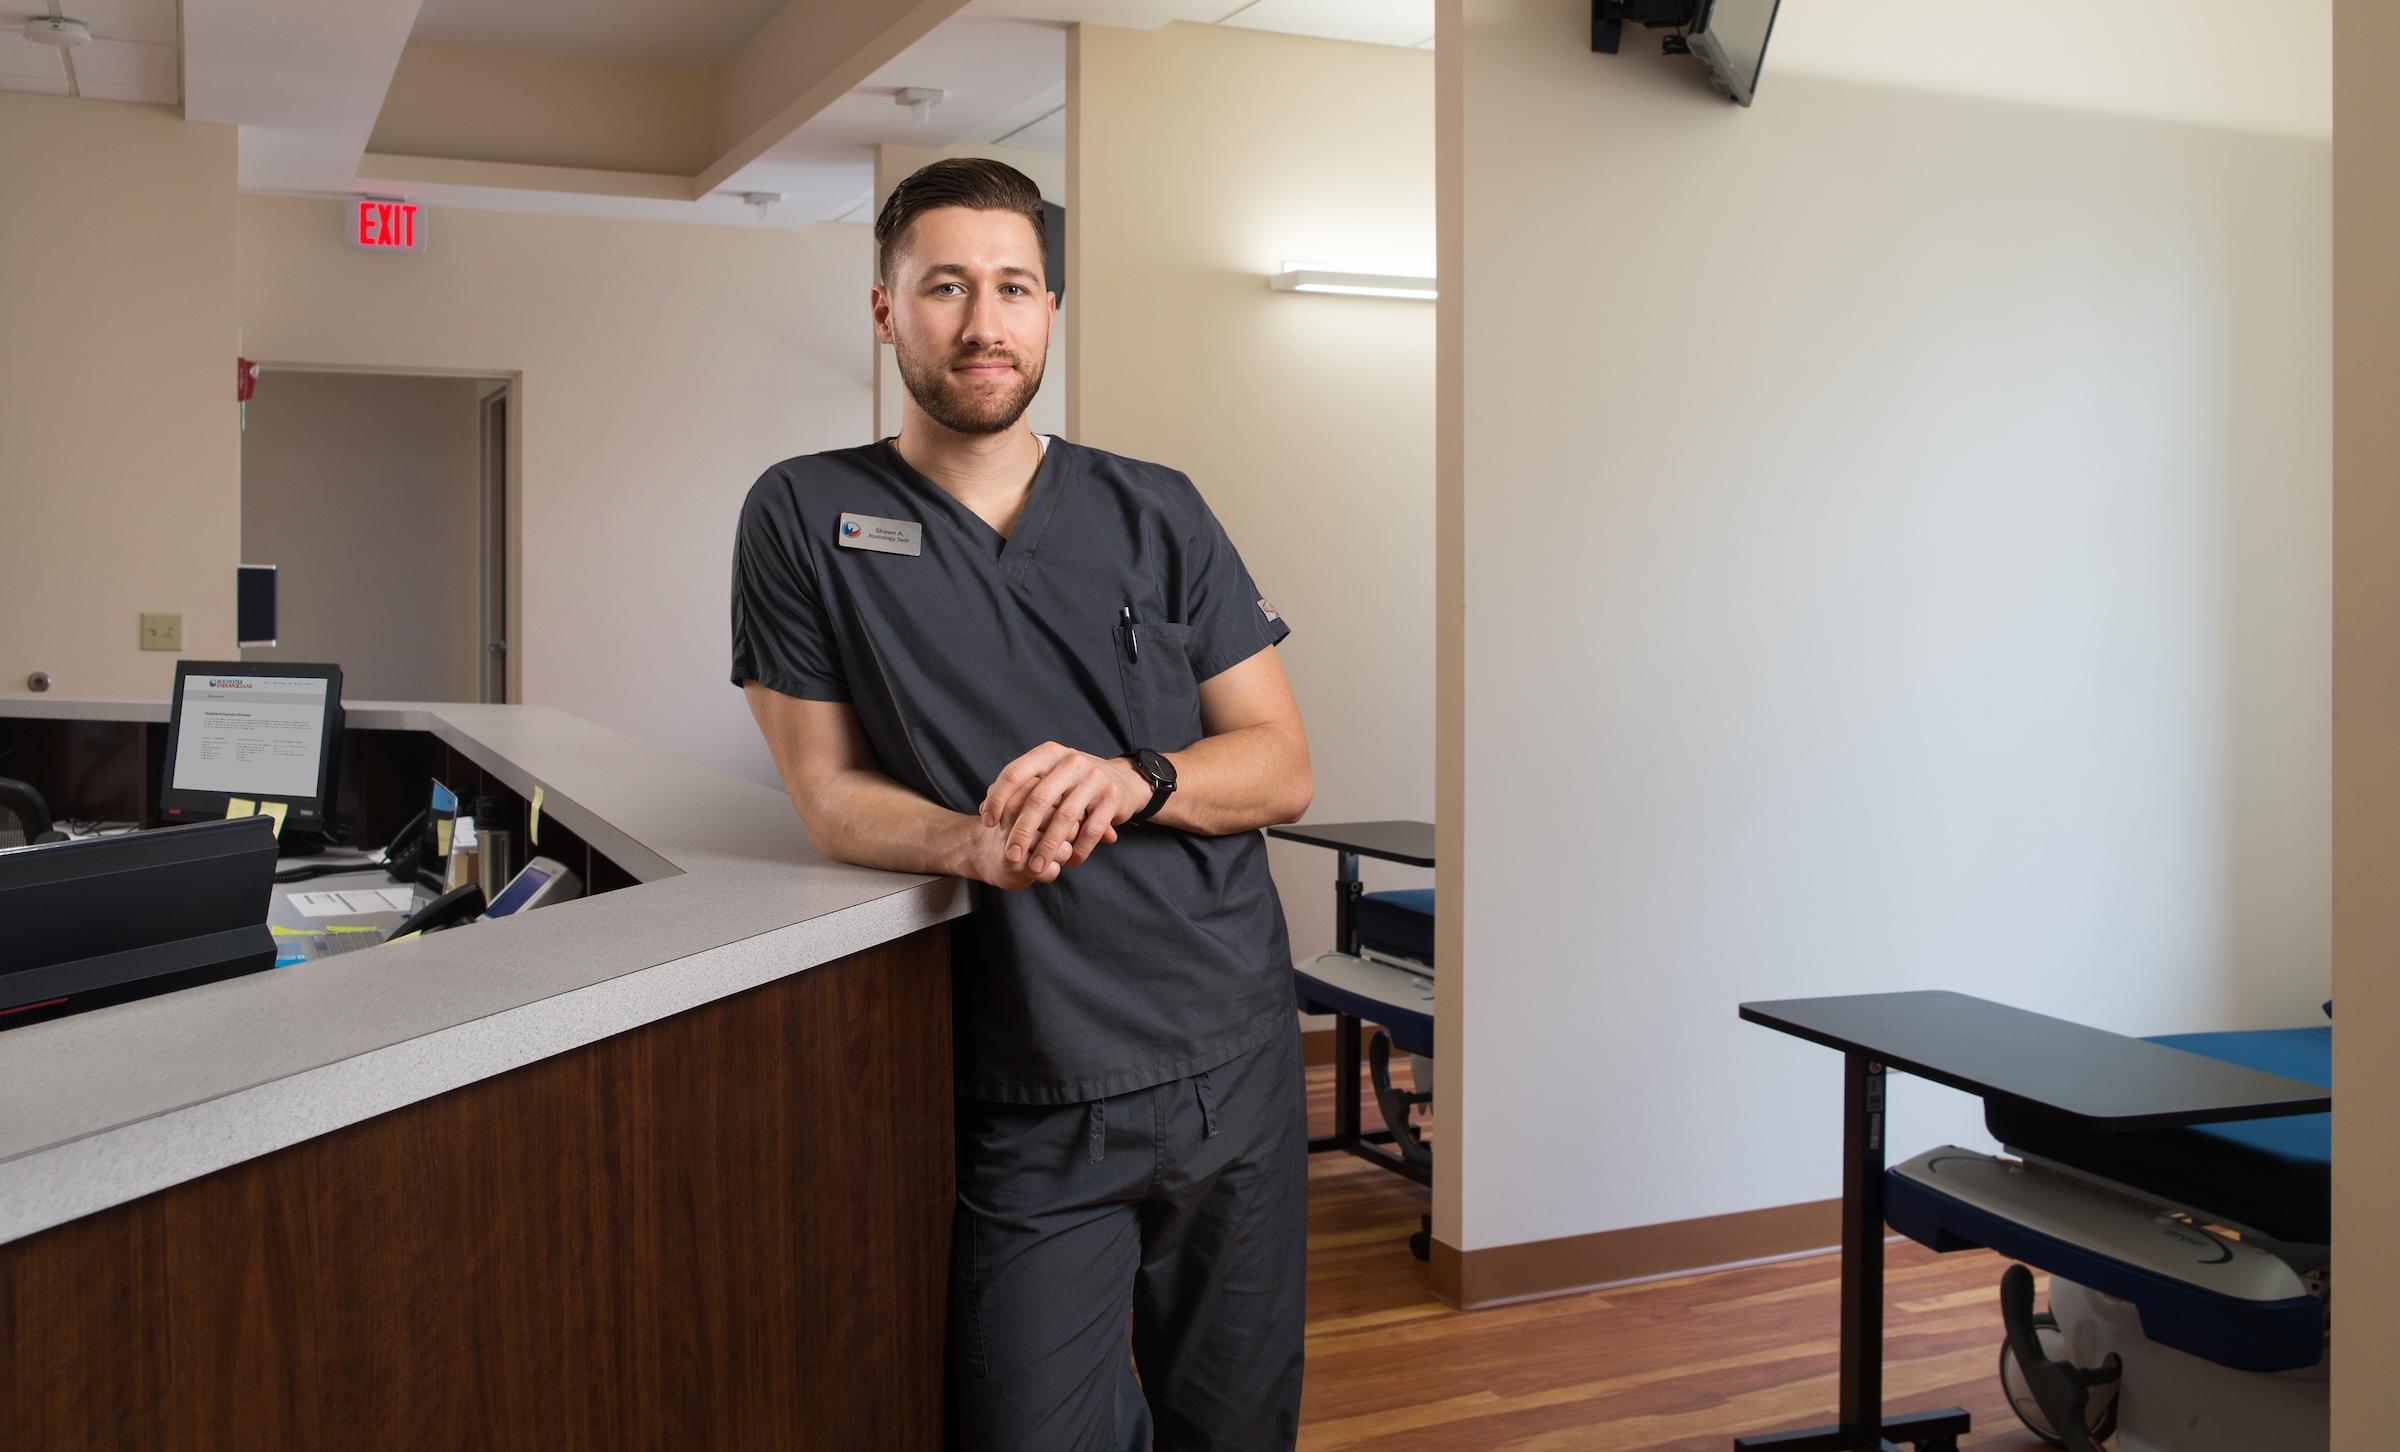 Shawn Axtell R.T. - Vascular radiologic technologist